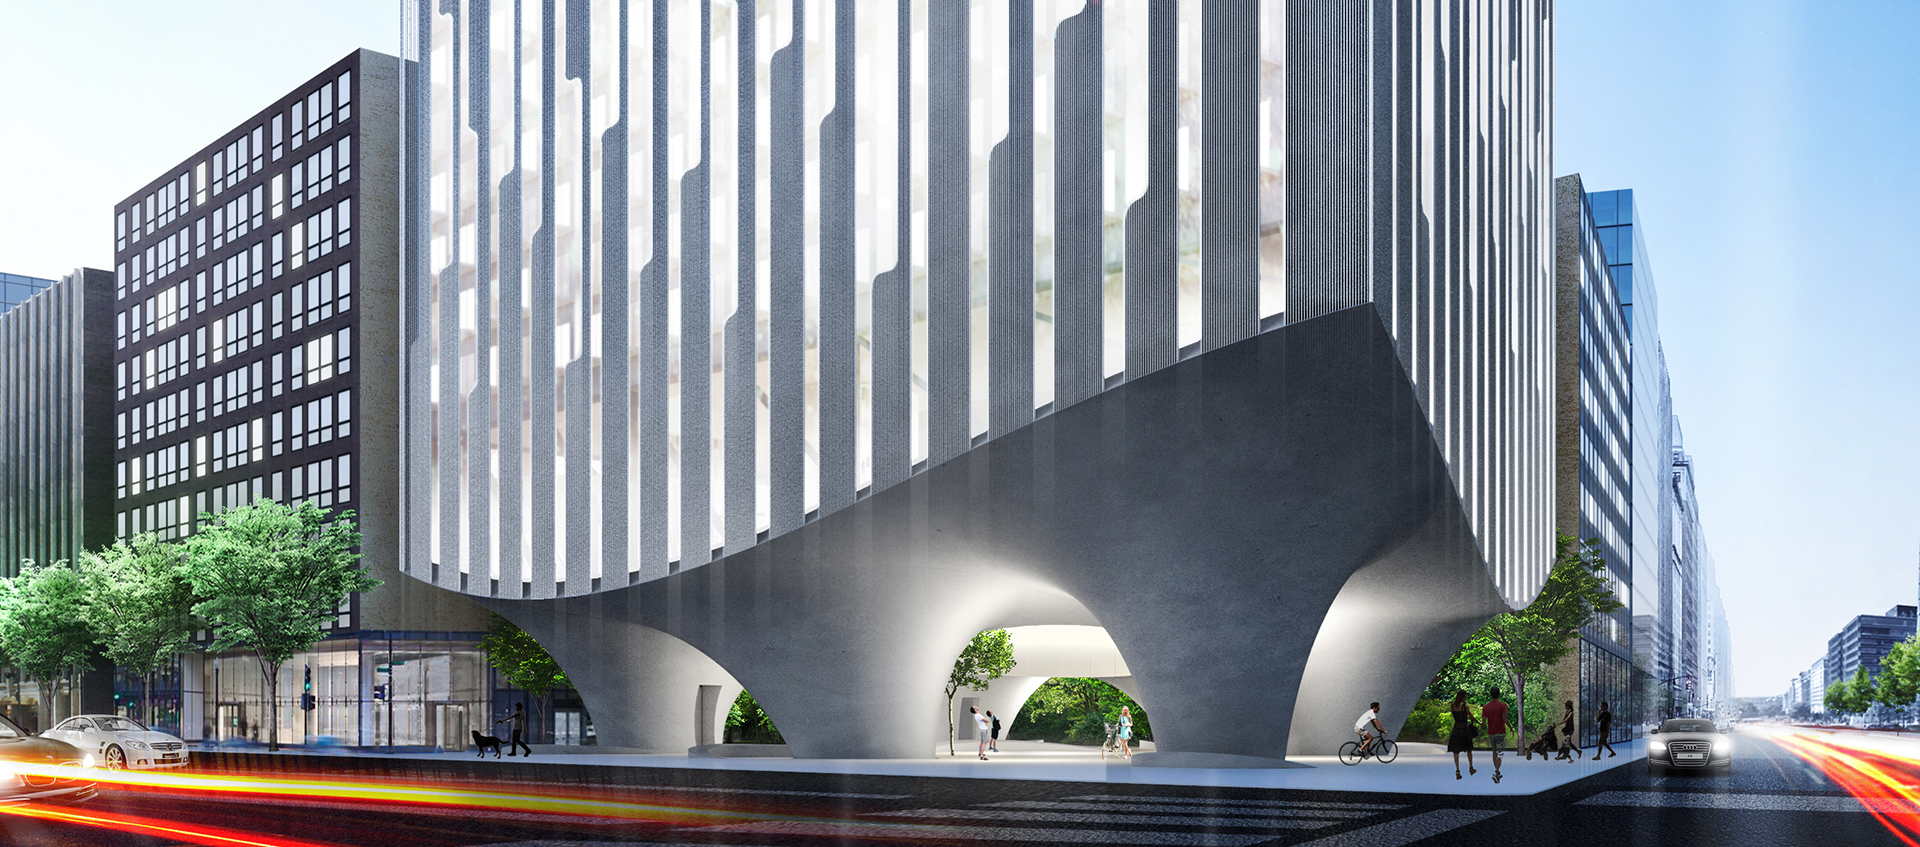 DFG-Architetti_D-Urban-Erosion-1-1